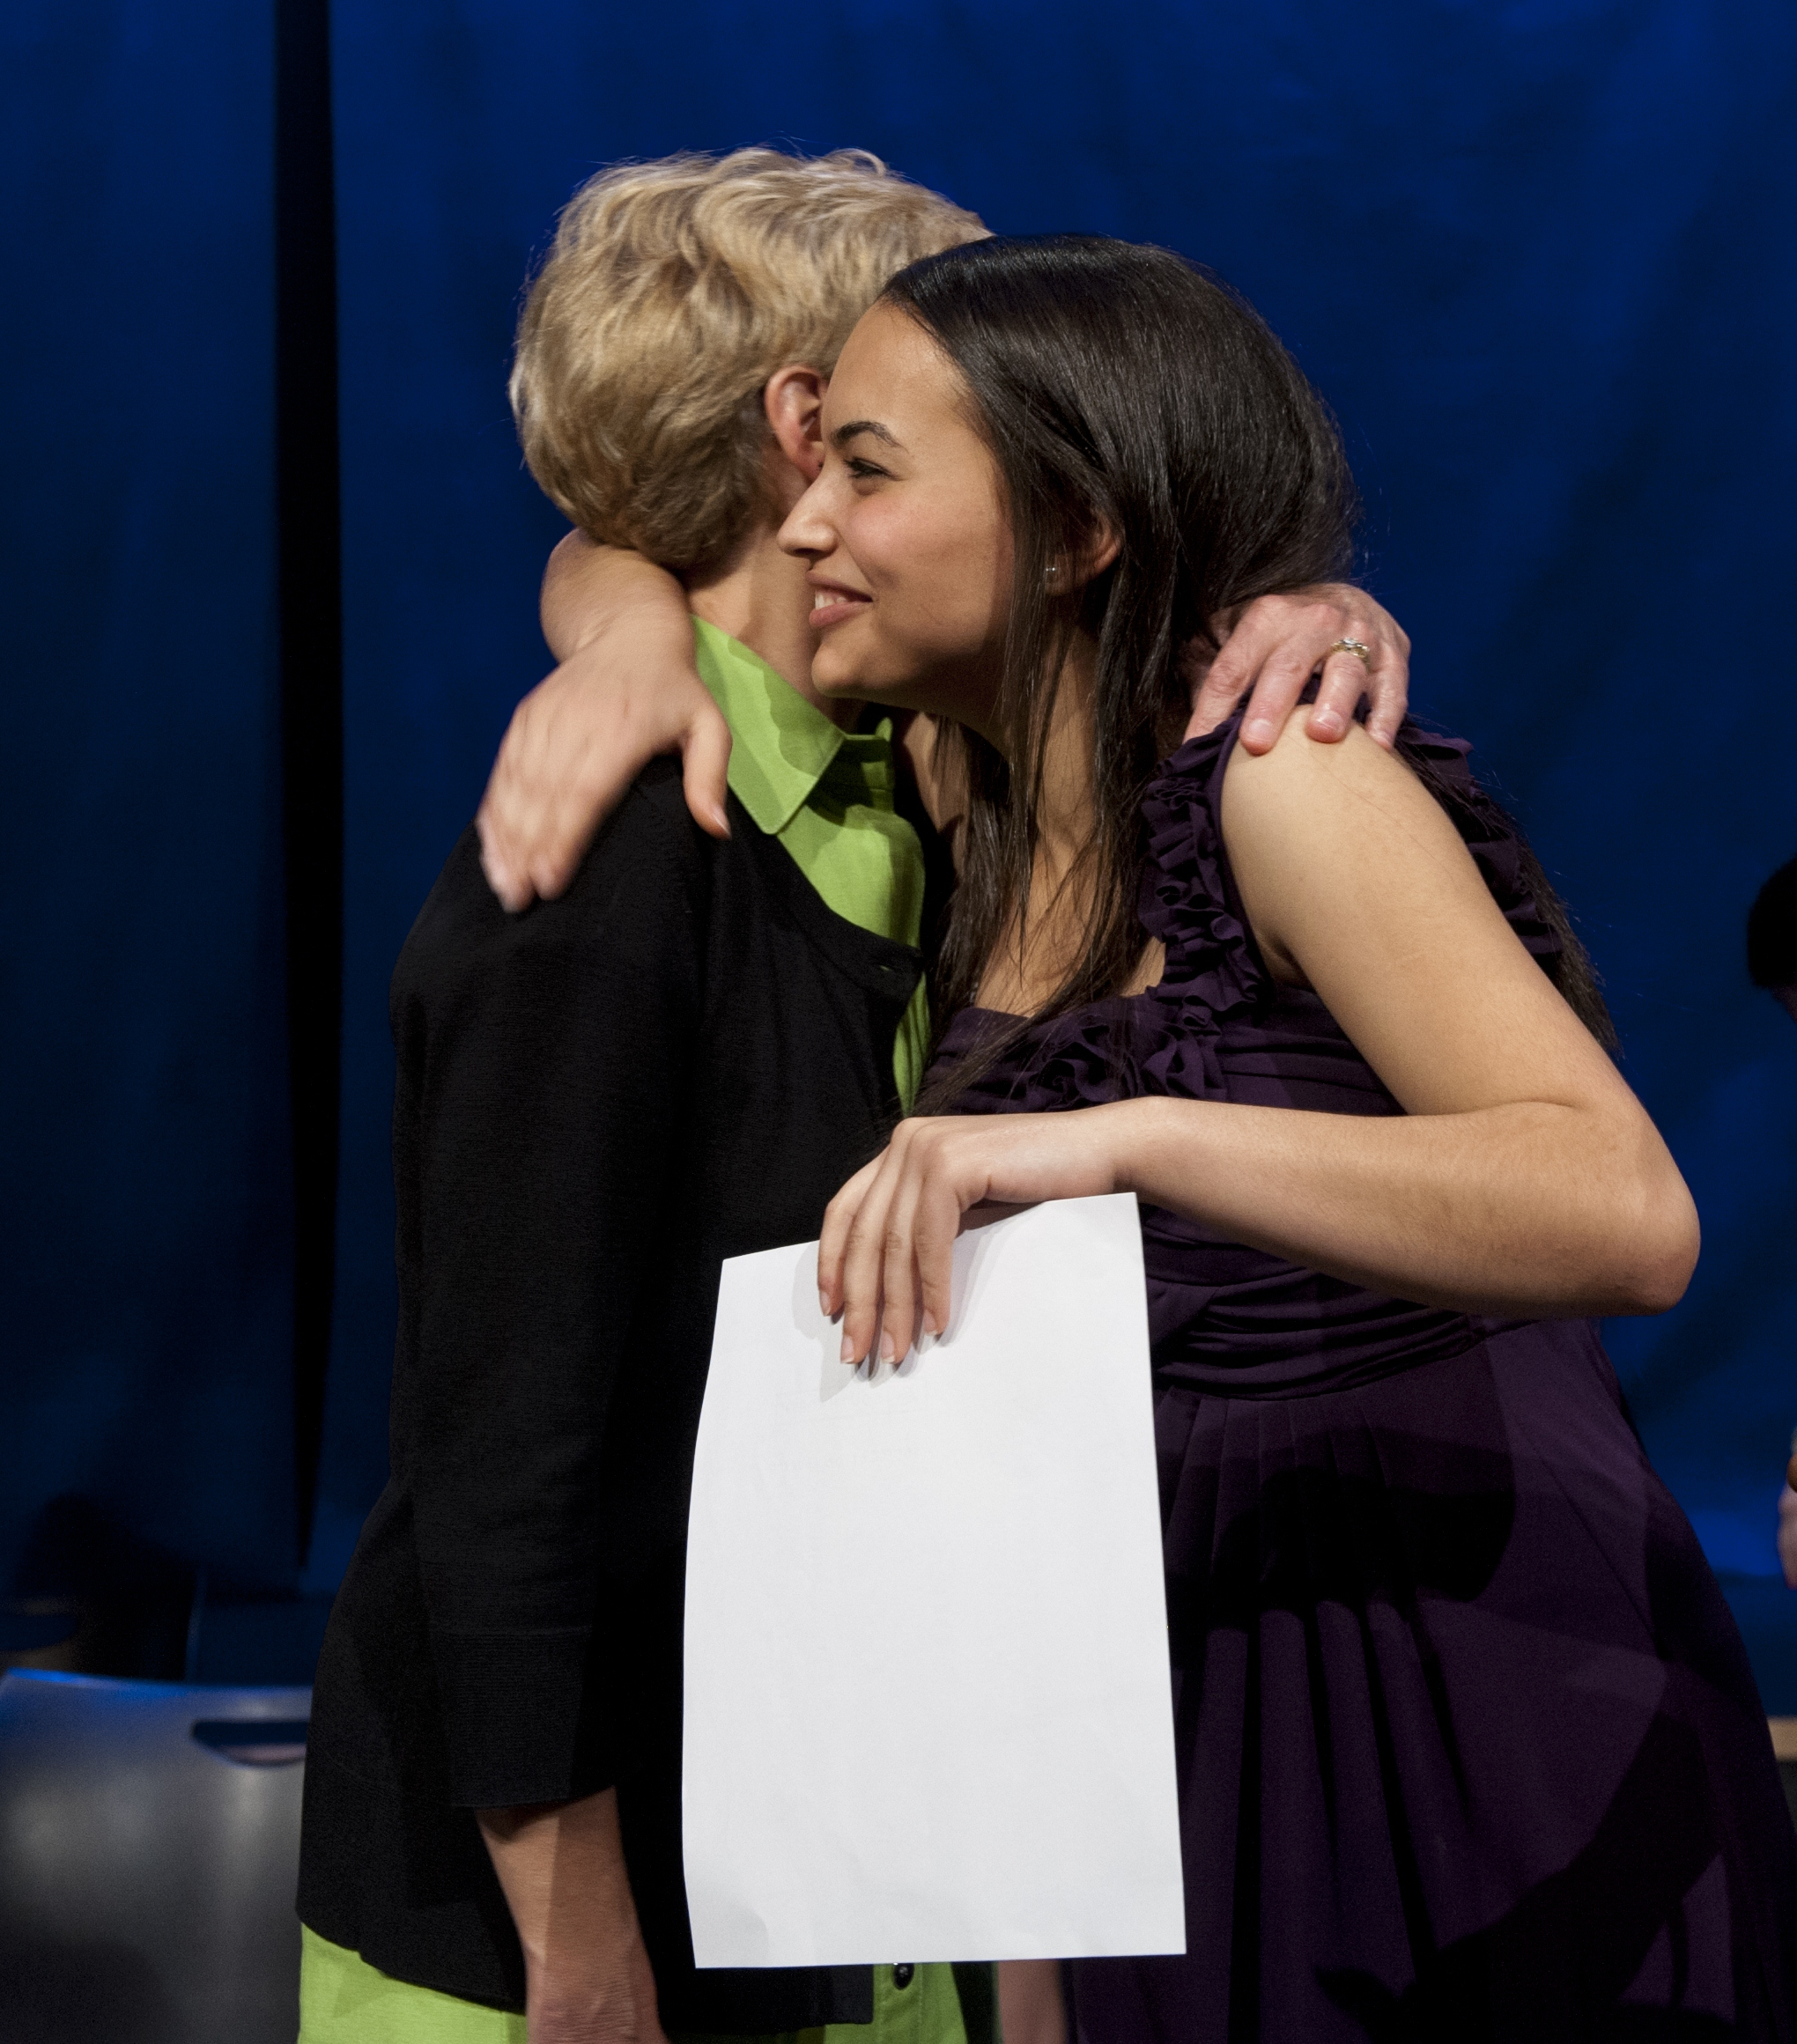 Freeman High School 2012 Scholarship winner, Dina Ayad, with her GRASP advisor, Janet Andrews.